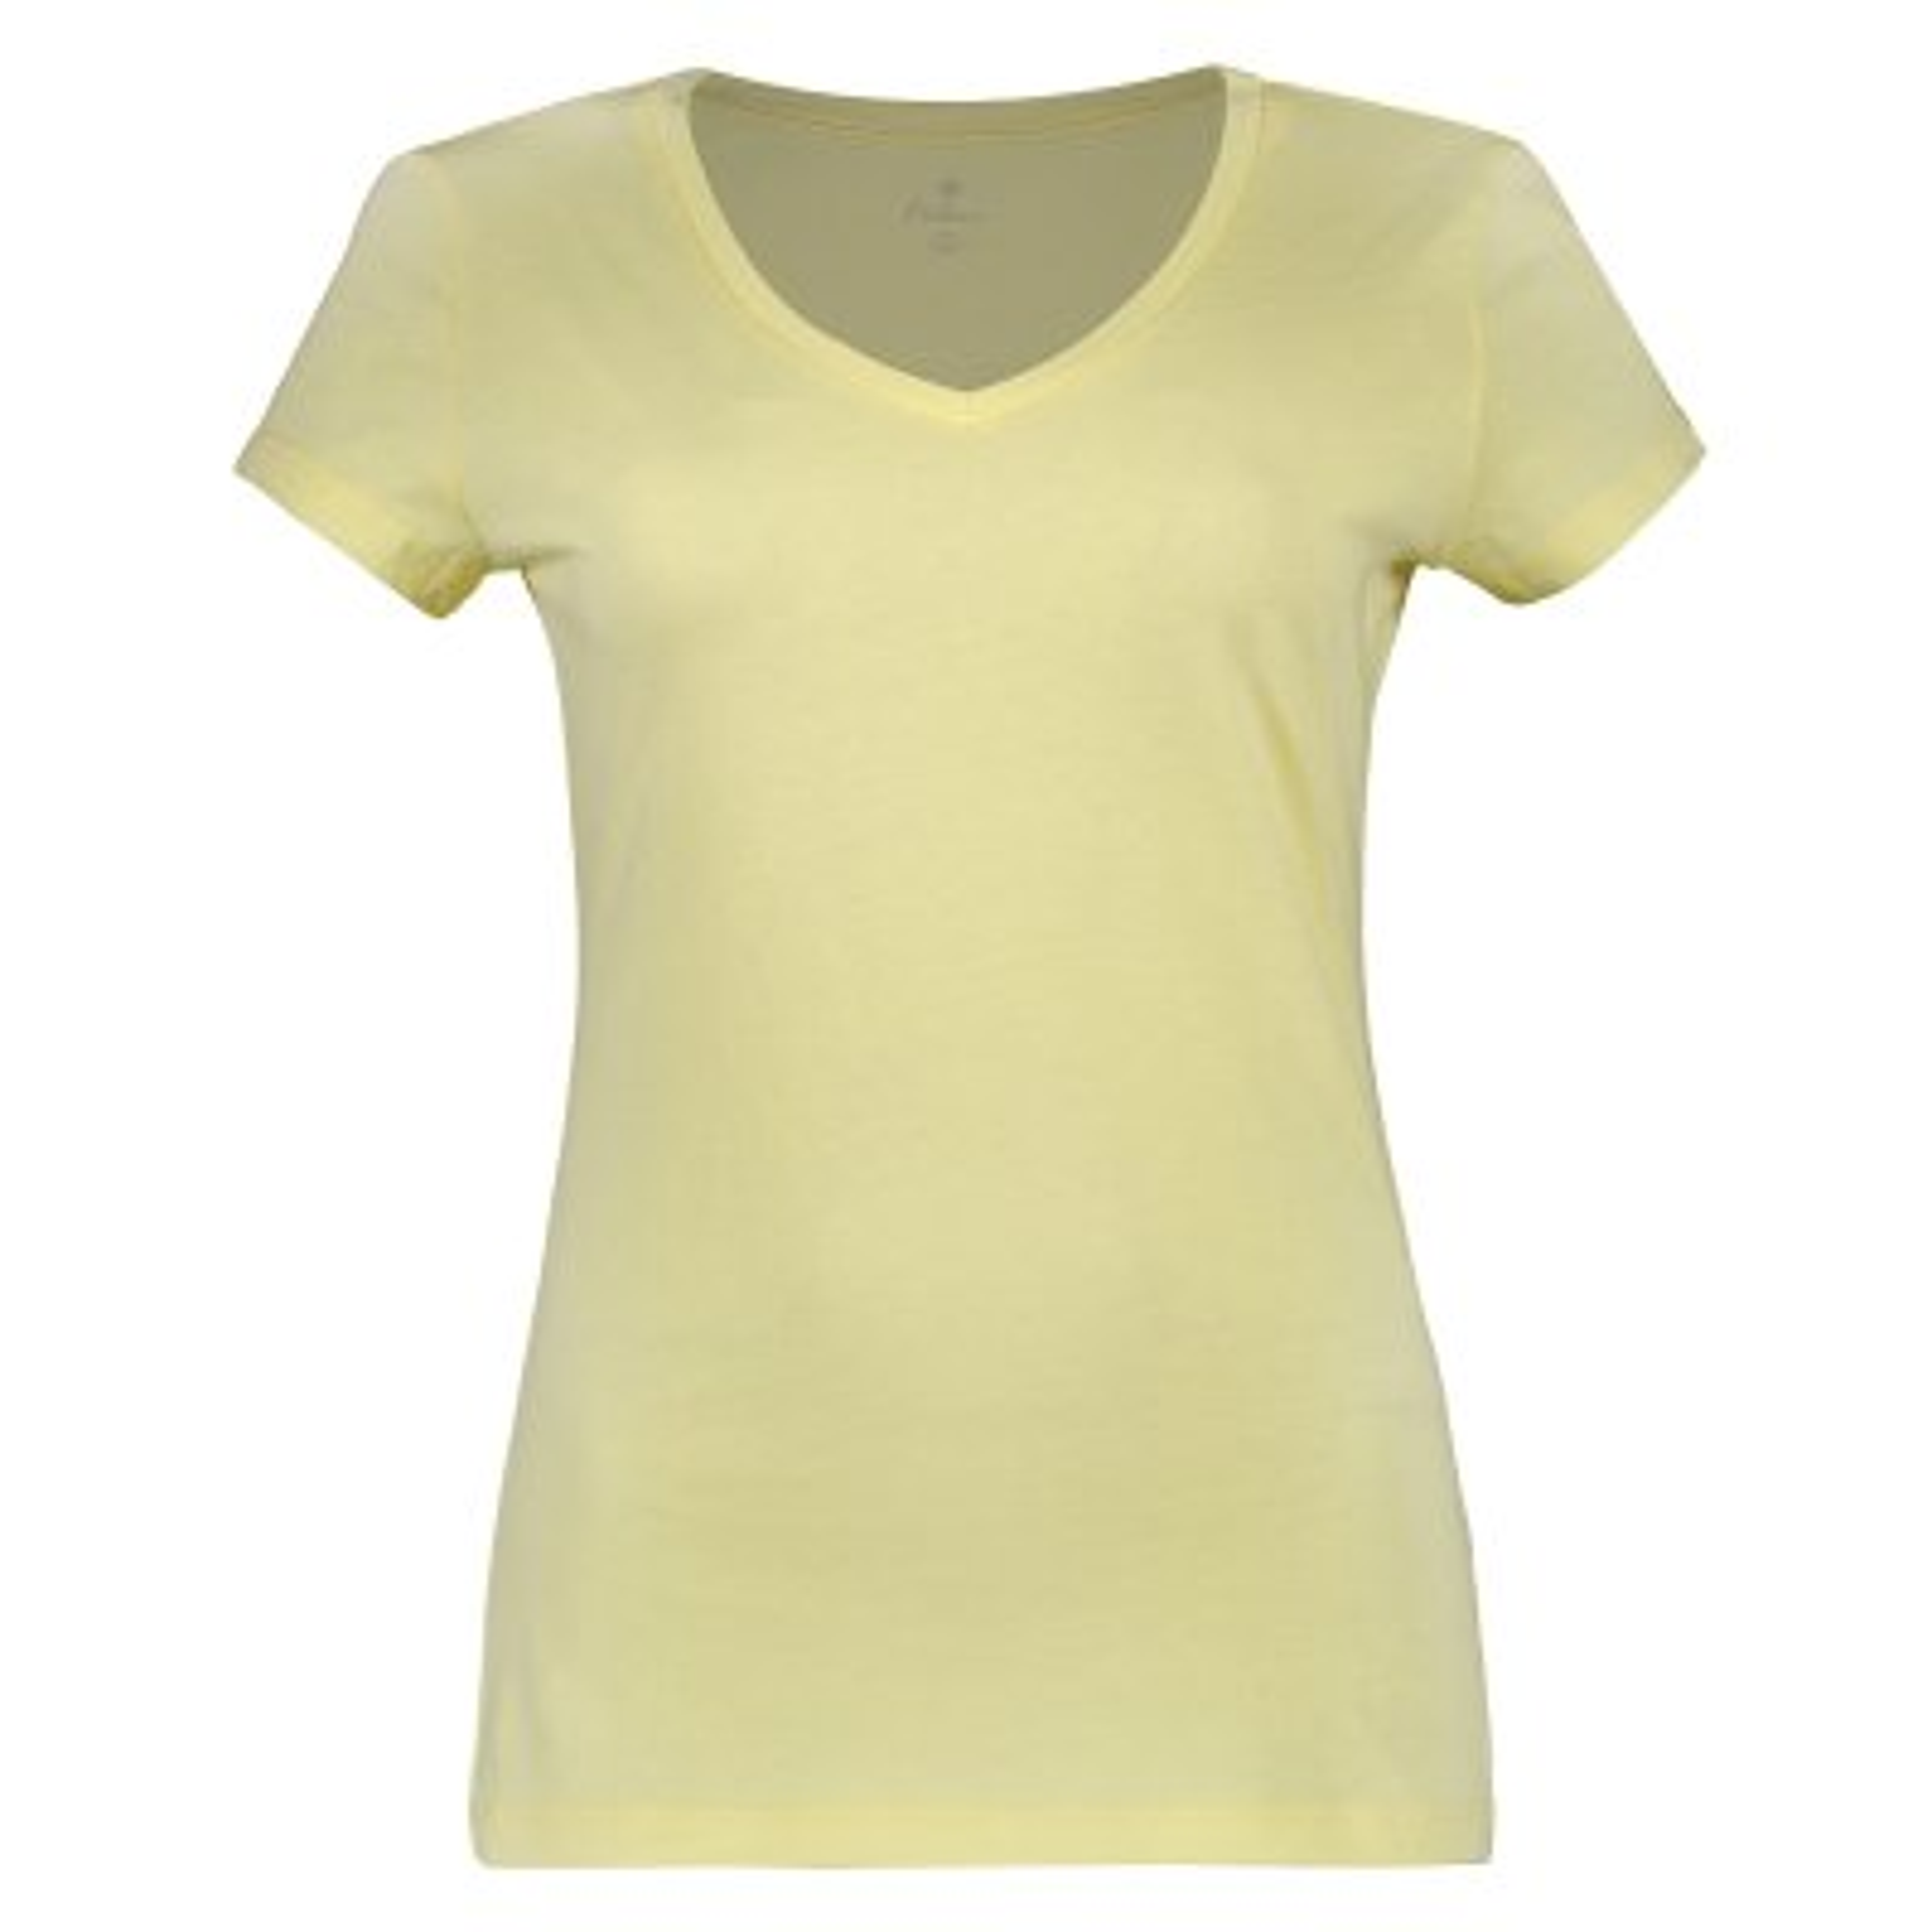 تصویر تی شرت زنانه کالینز مدل CL1019324-YELLOW